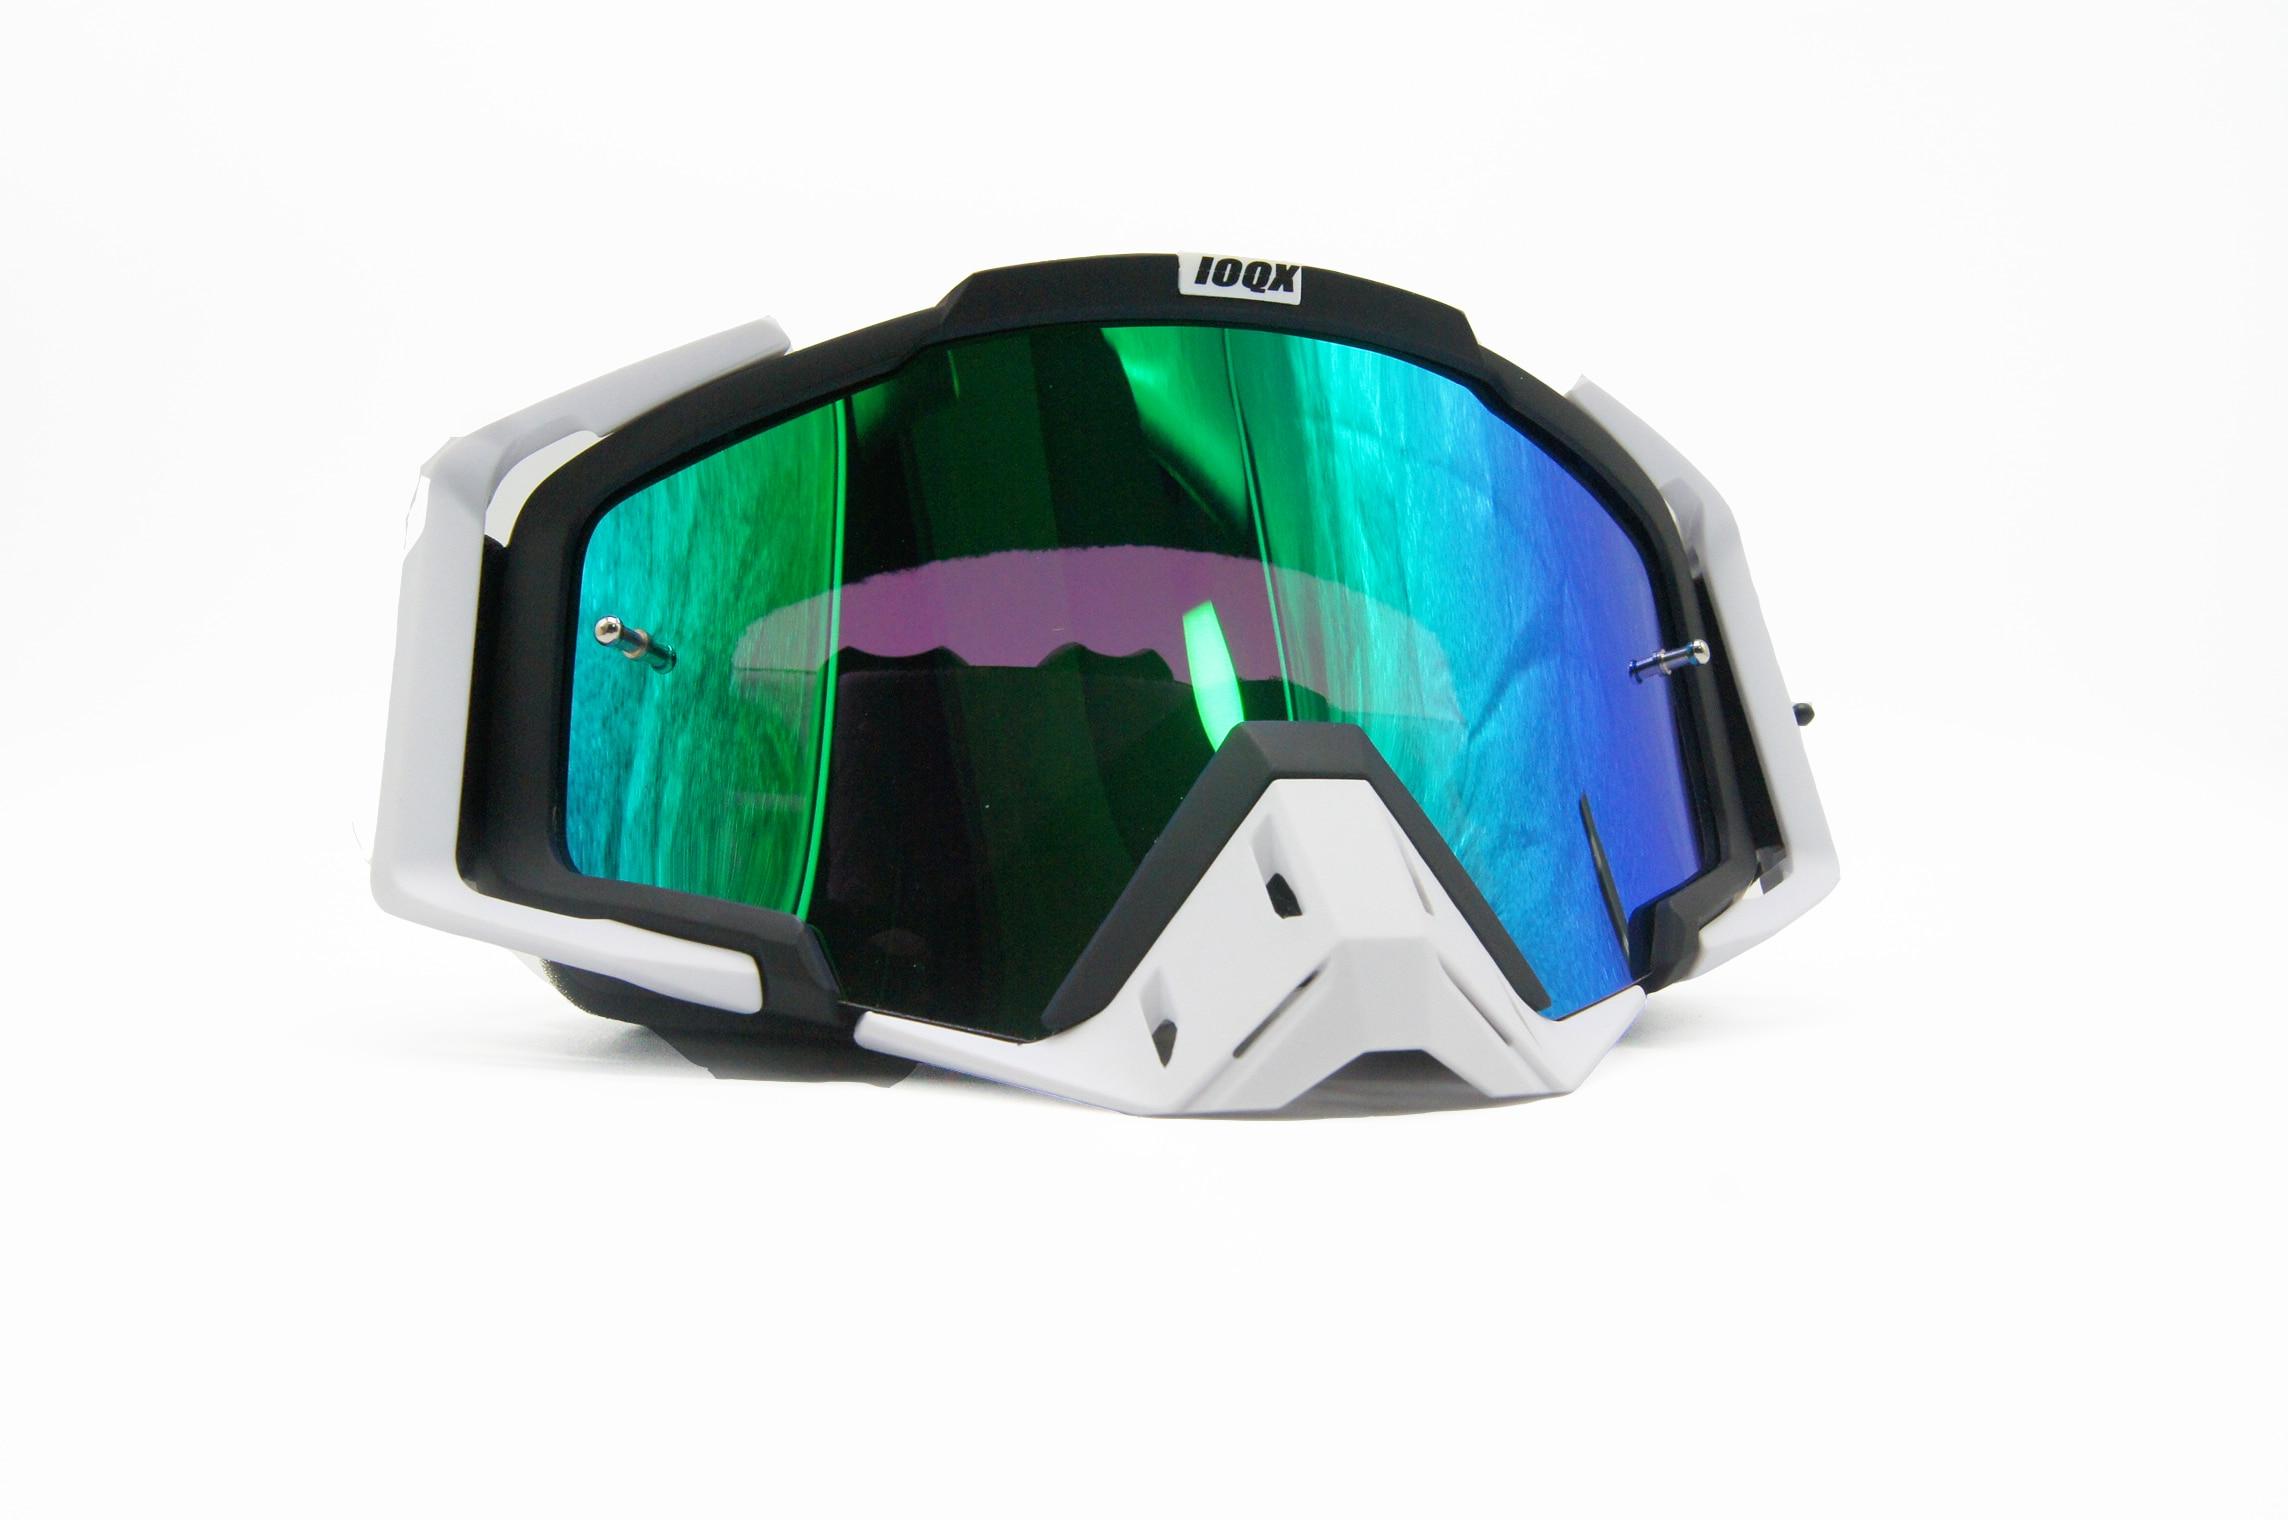 IOQX Dirt Bike Goggles Downhill Motocross Glasses Dustproof Motocross Goggles Cross Glasses Off Road Oculos Motorcycle Gafas enlarge